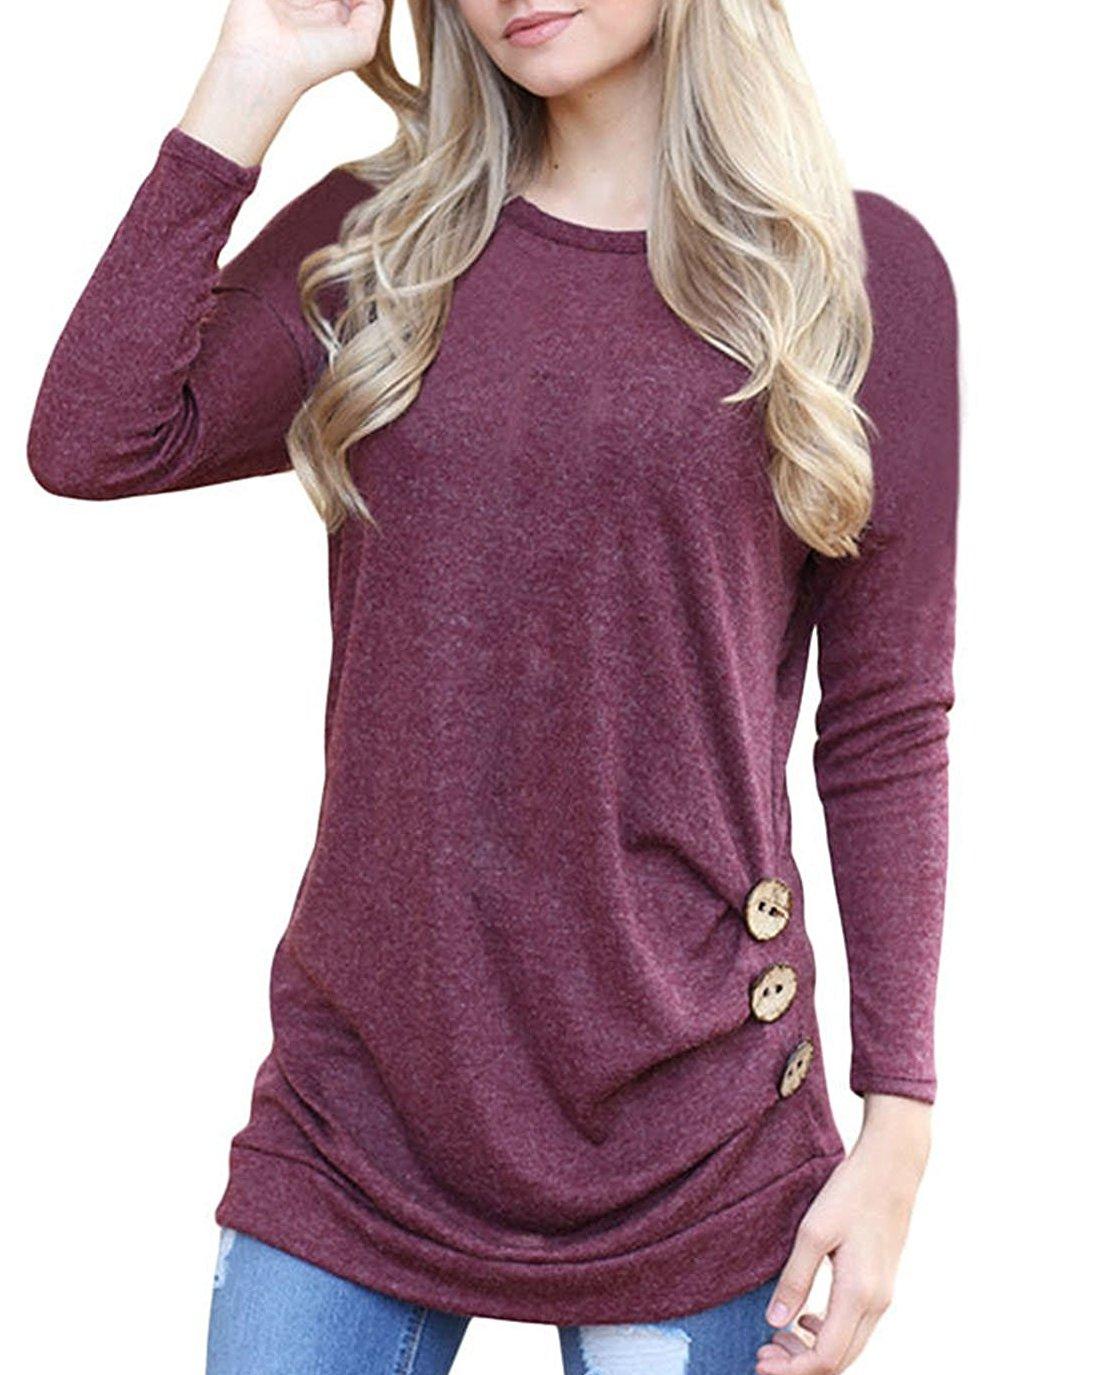 Women's Casual Tunic Top Sweatshirt Long Sleeve Blouse T-Shirt Button Decor Wine Red M